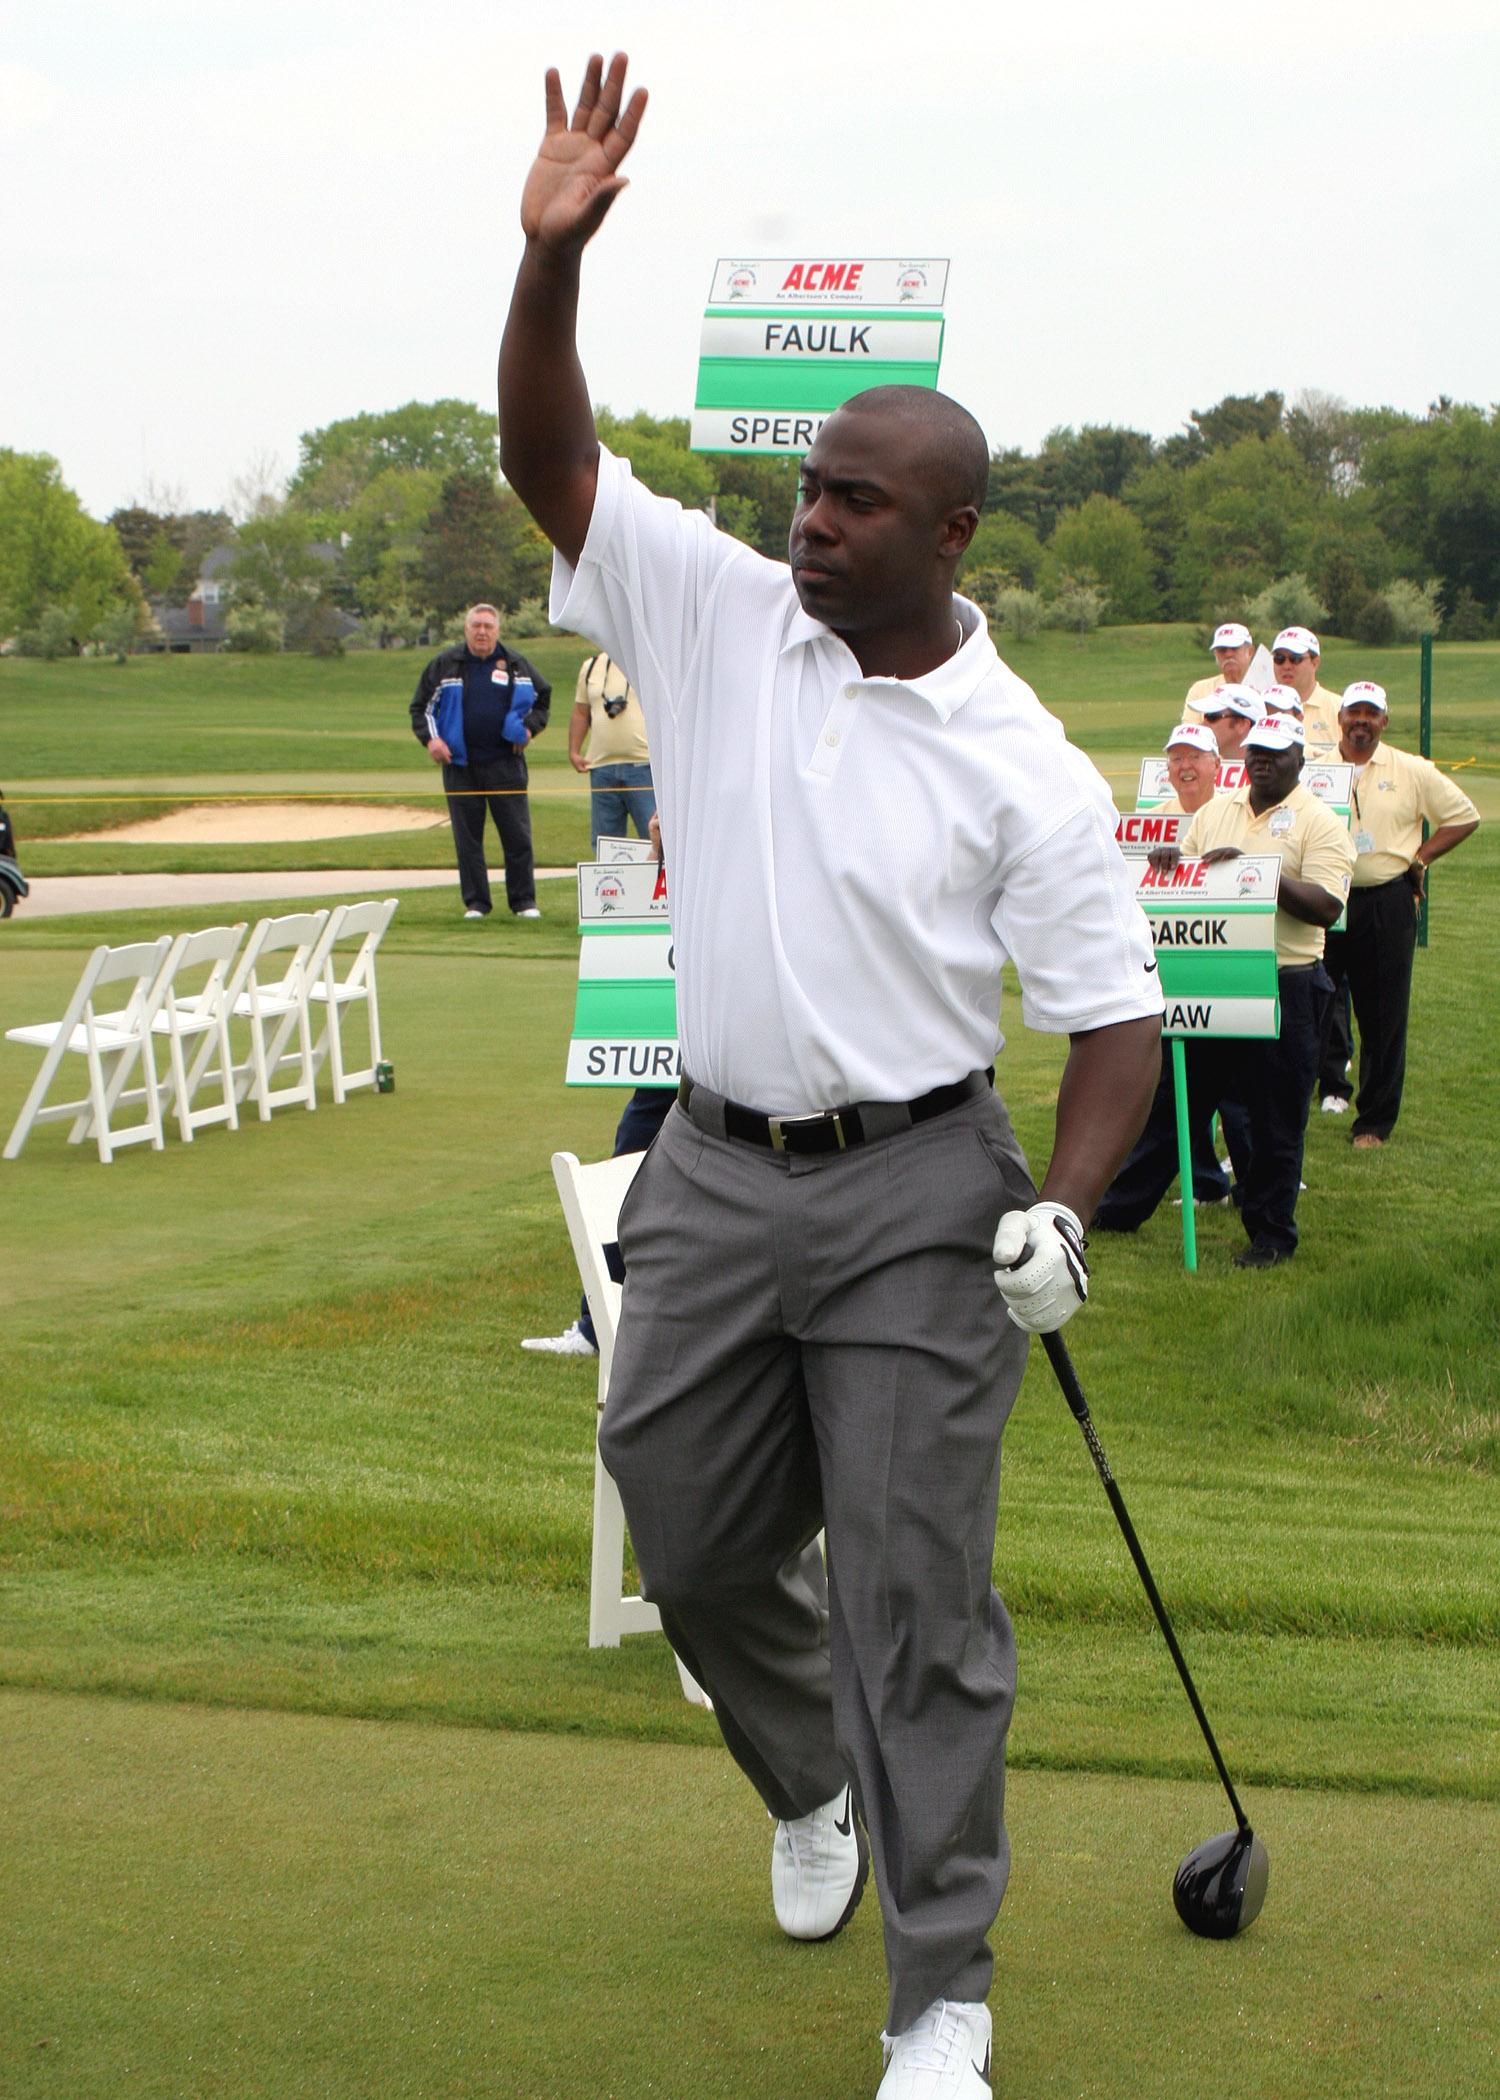 Marshall faulk celebrity golf tournament